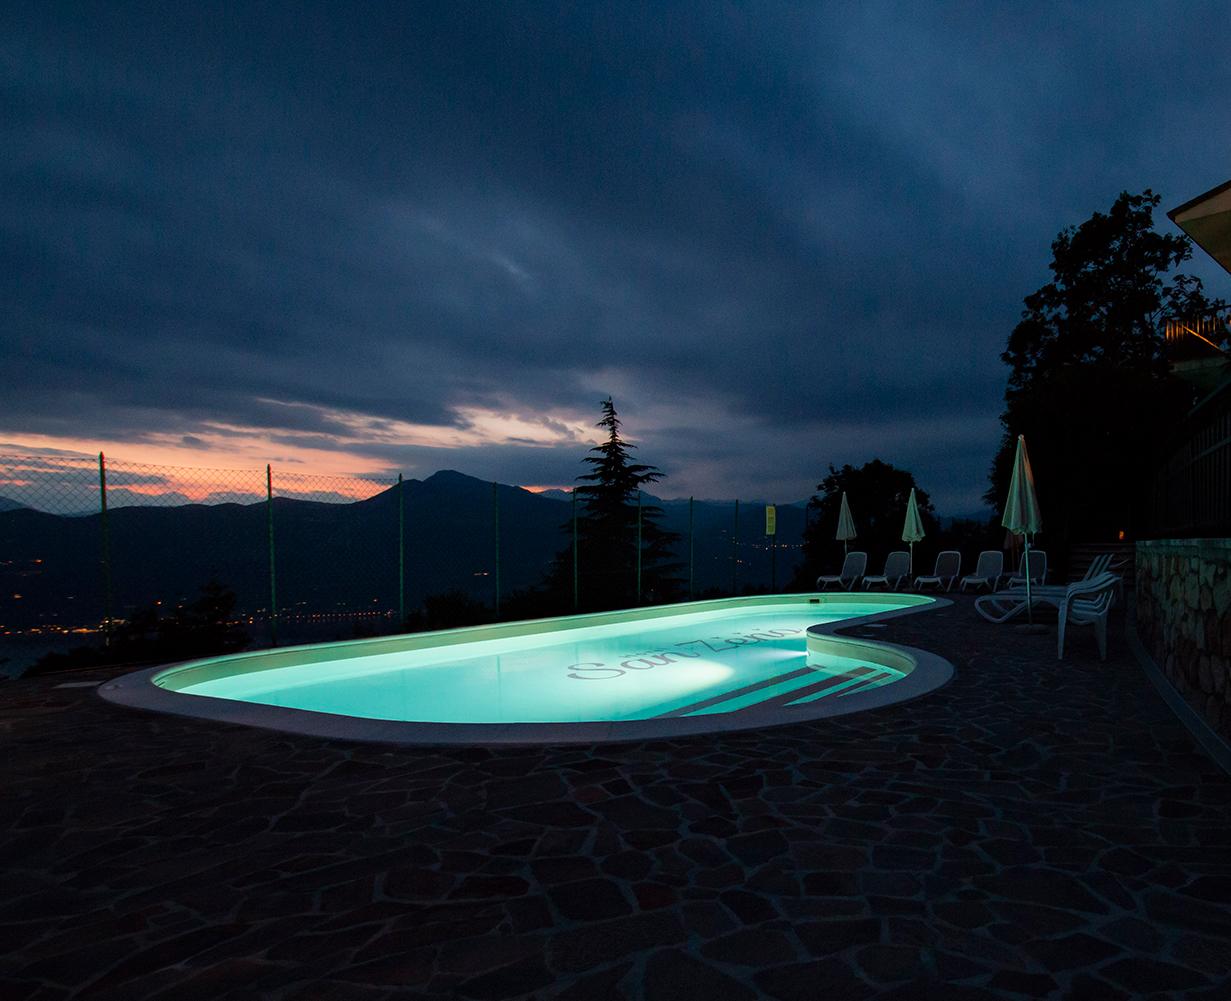 piscina-notturna-lago-garda-hotel-san-zeno